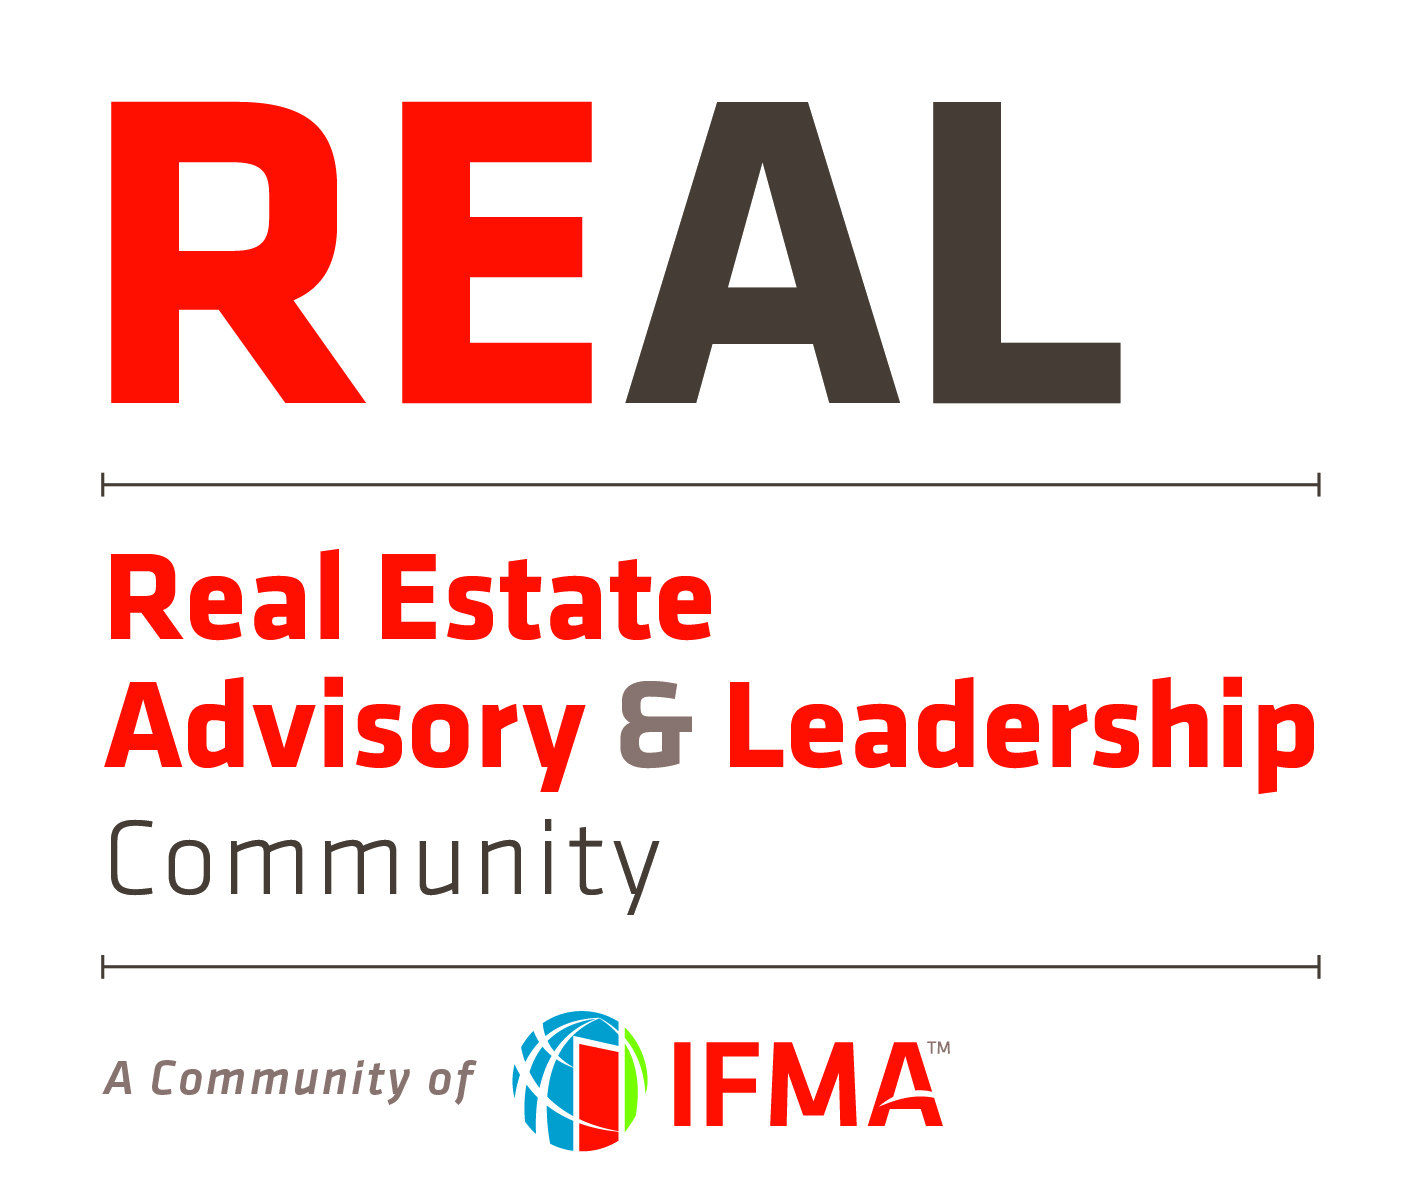 IFMA-Community_REAL(print)